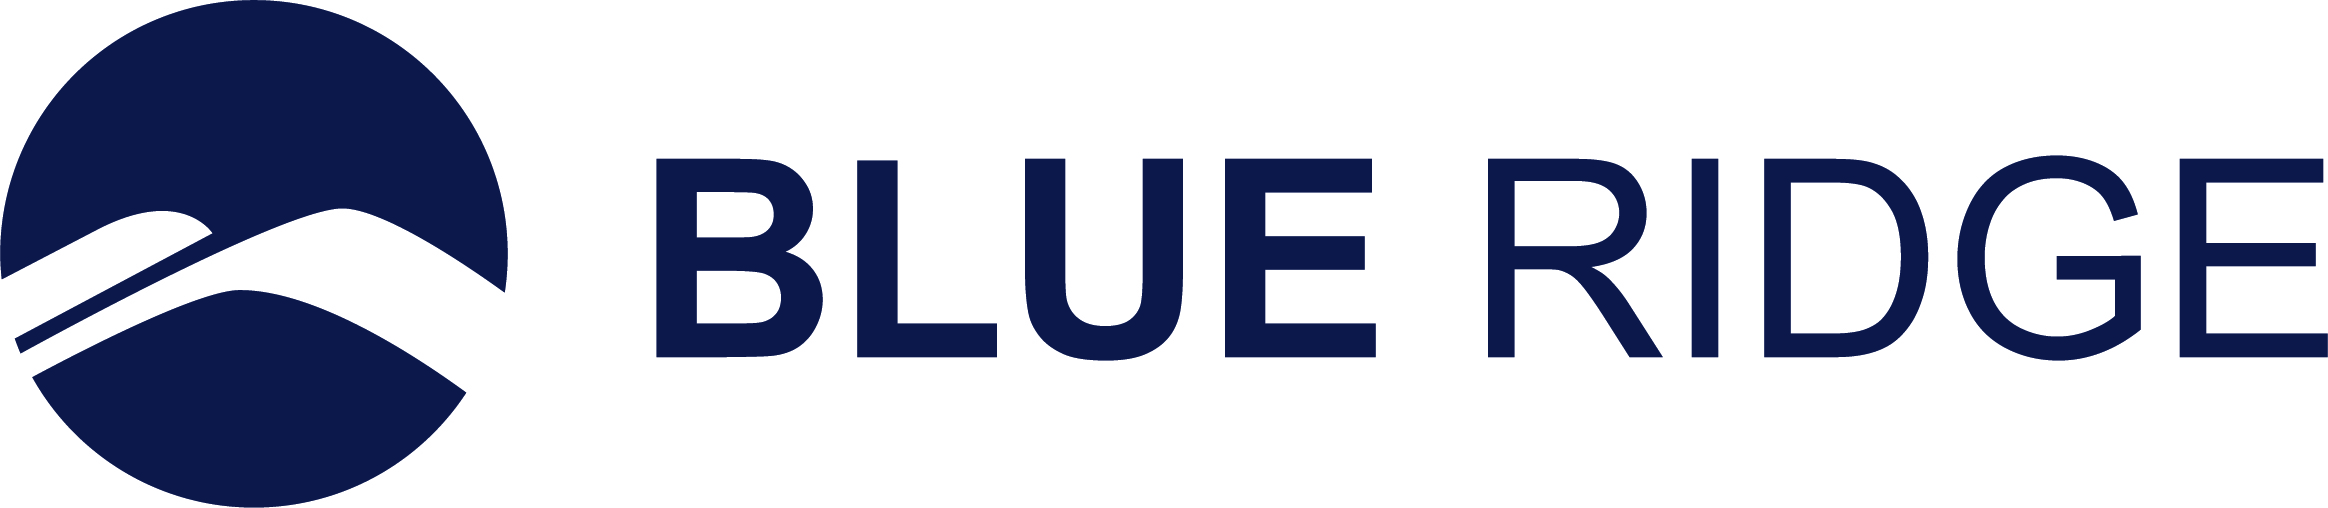 Jim Byrnes CEO at Blue Ridge Talks Sense & Shape: Resiliency BLUEPRINT Conference